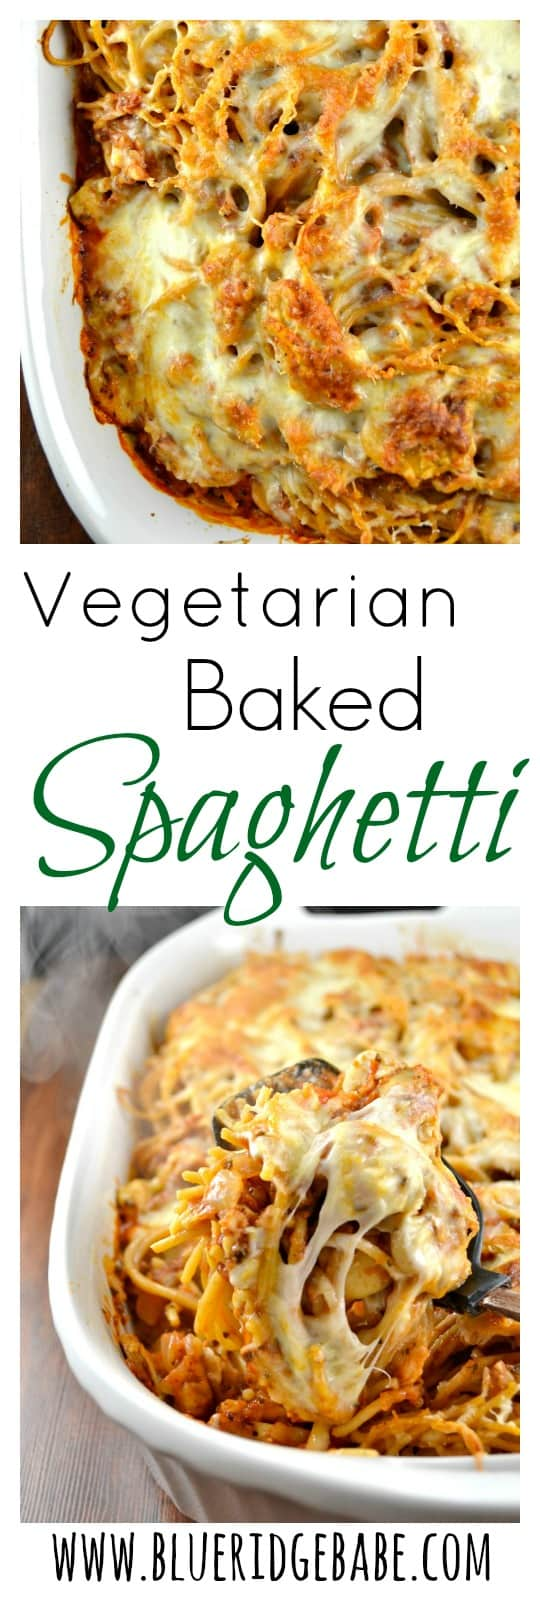 spicy vegetarian baked spaghetti